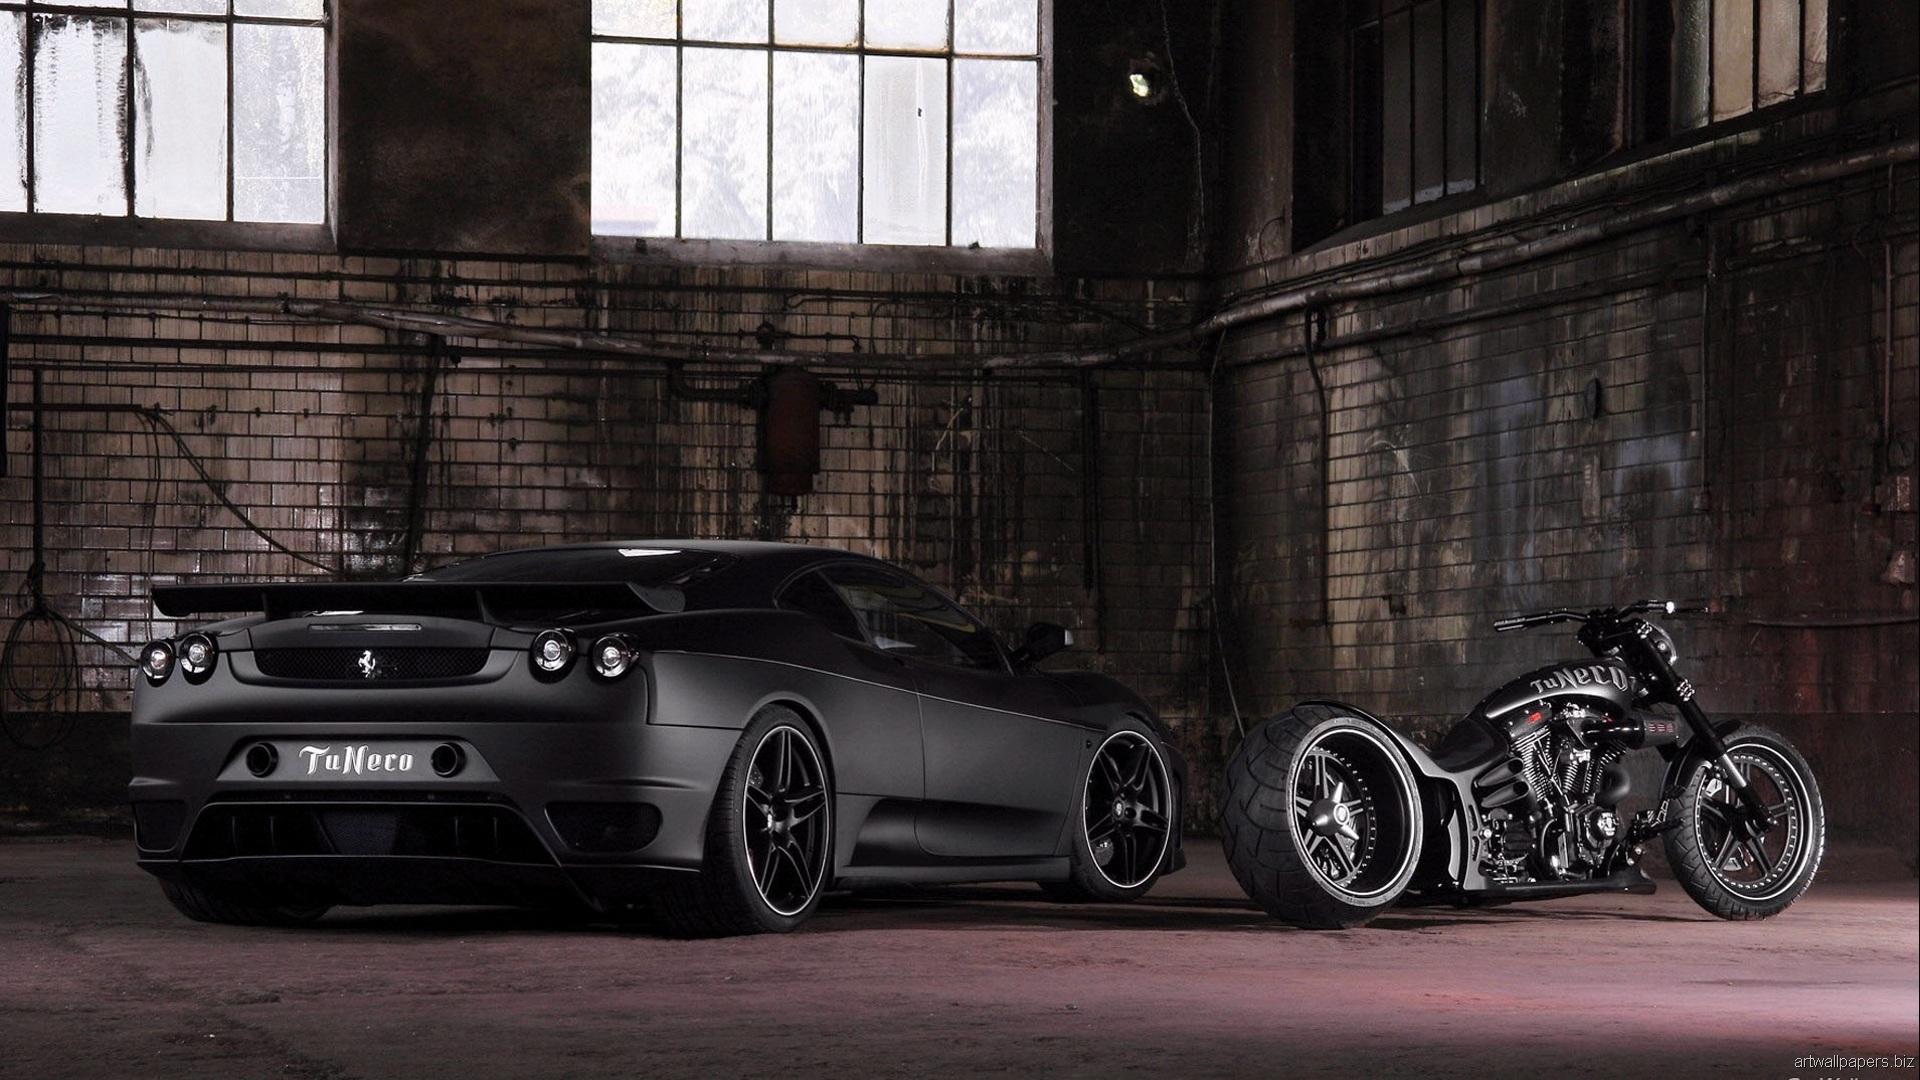 Ferrari Wallpapers Widescreen Full HD World Cars Gallery Free